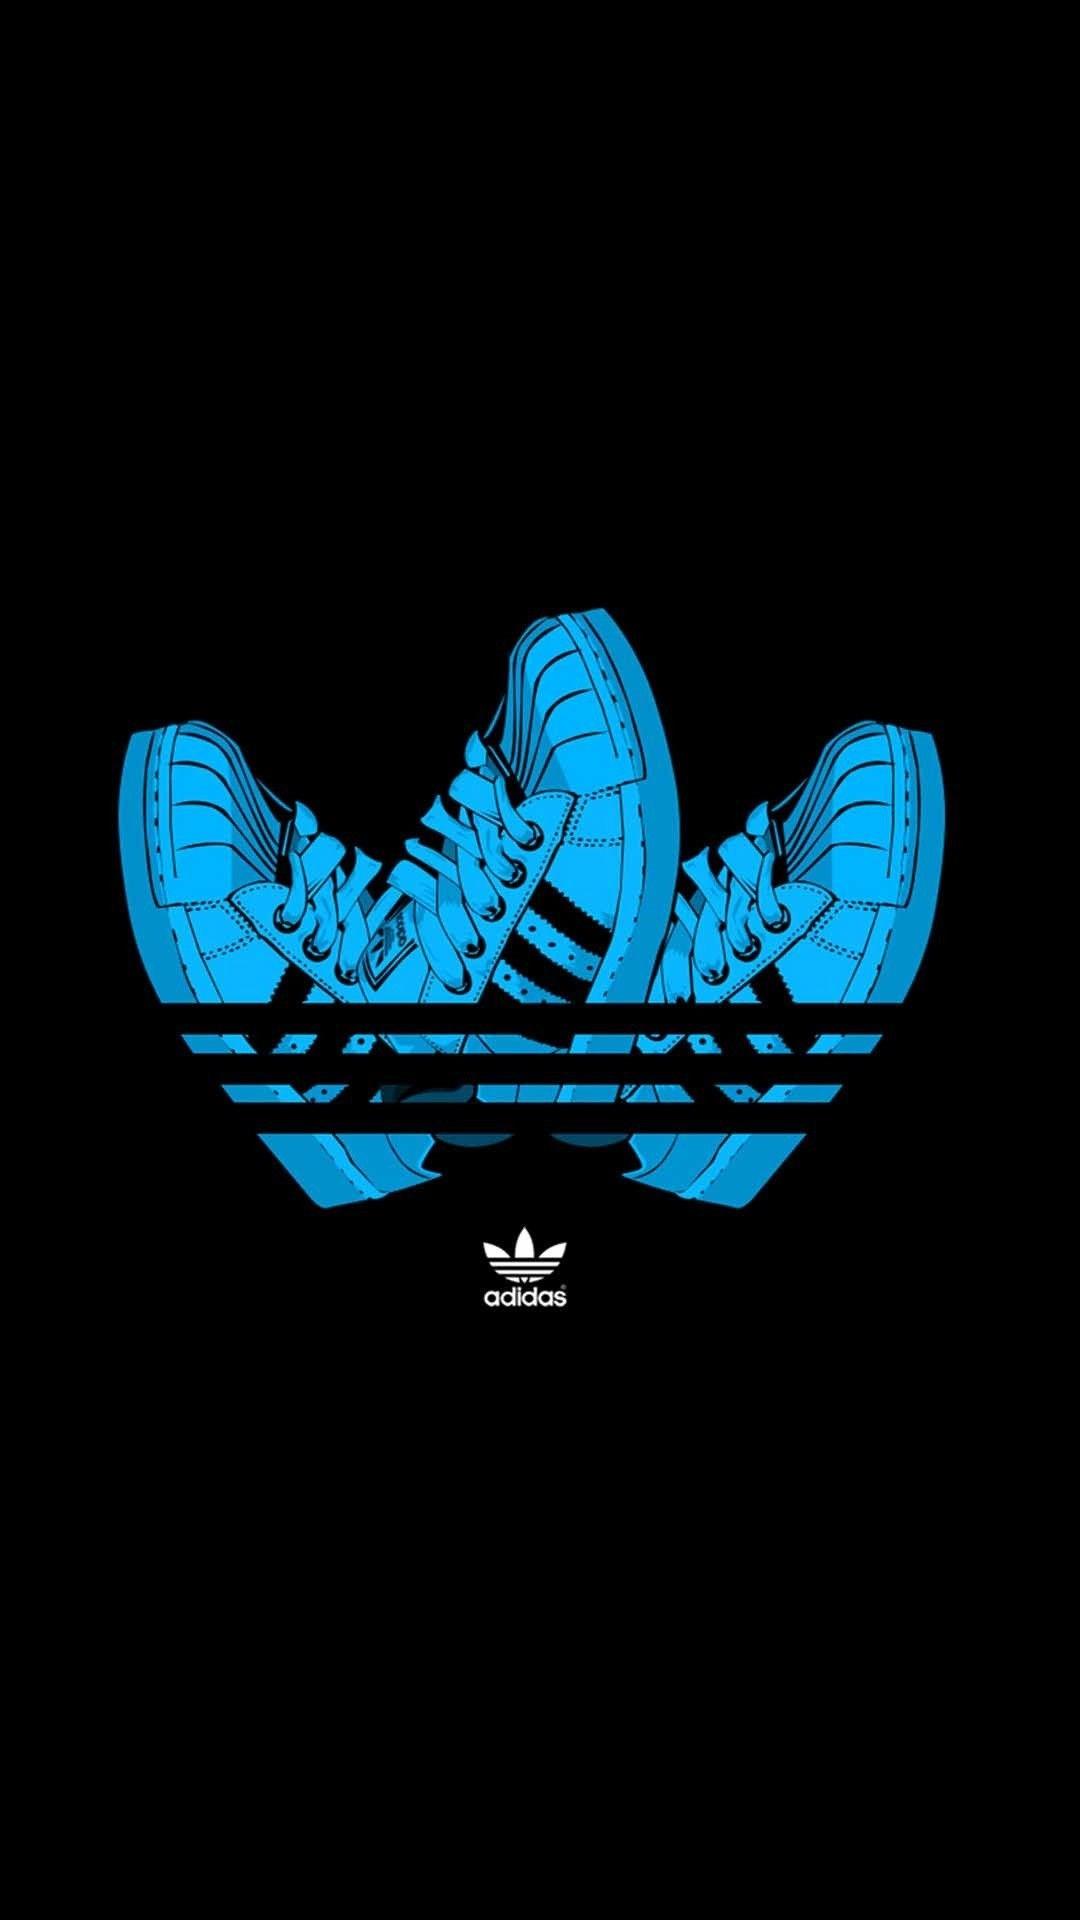 Black Adidas wallpaper